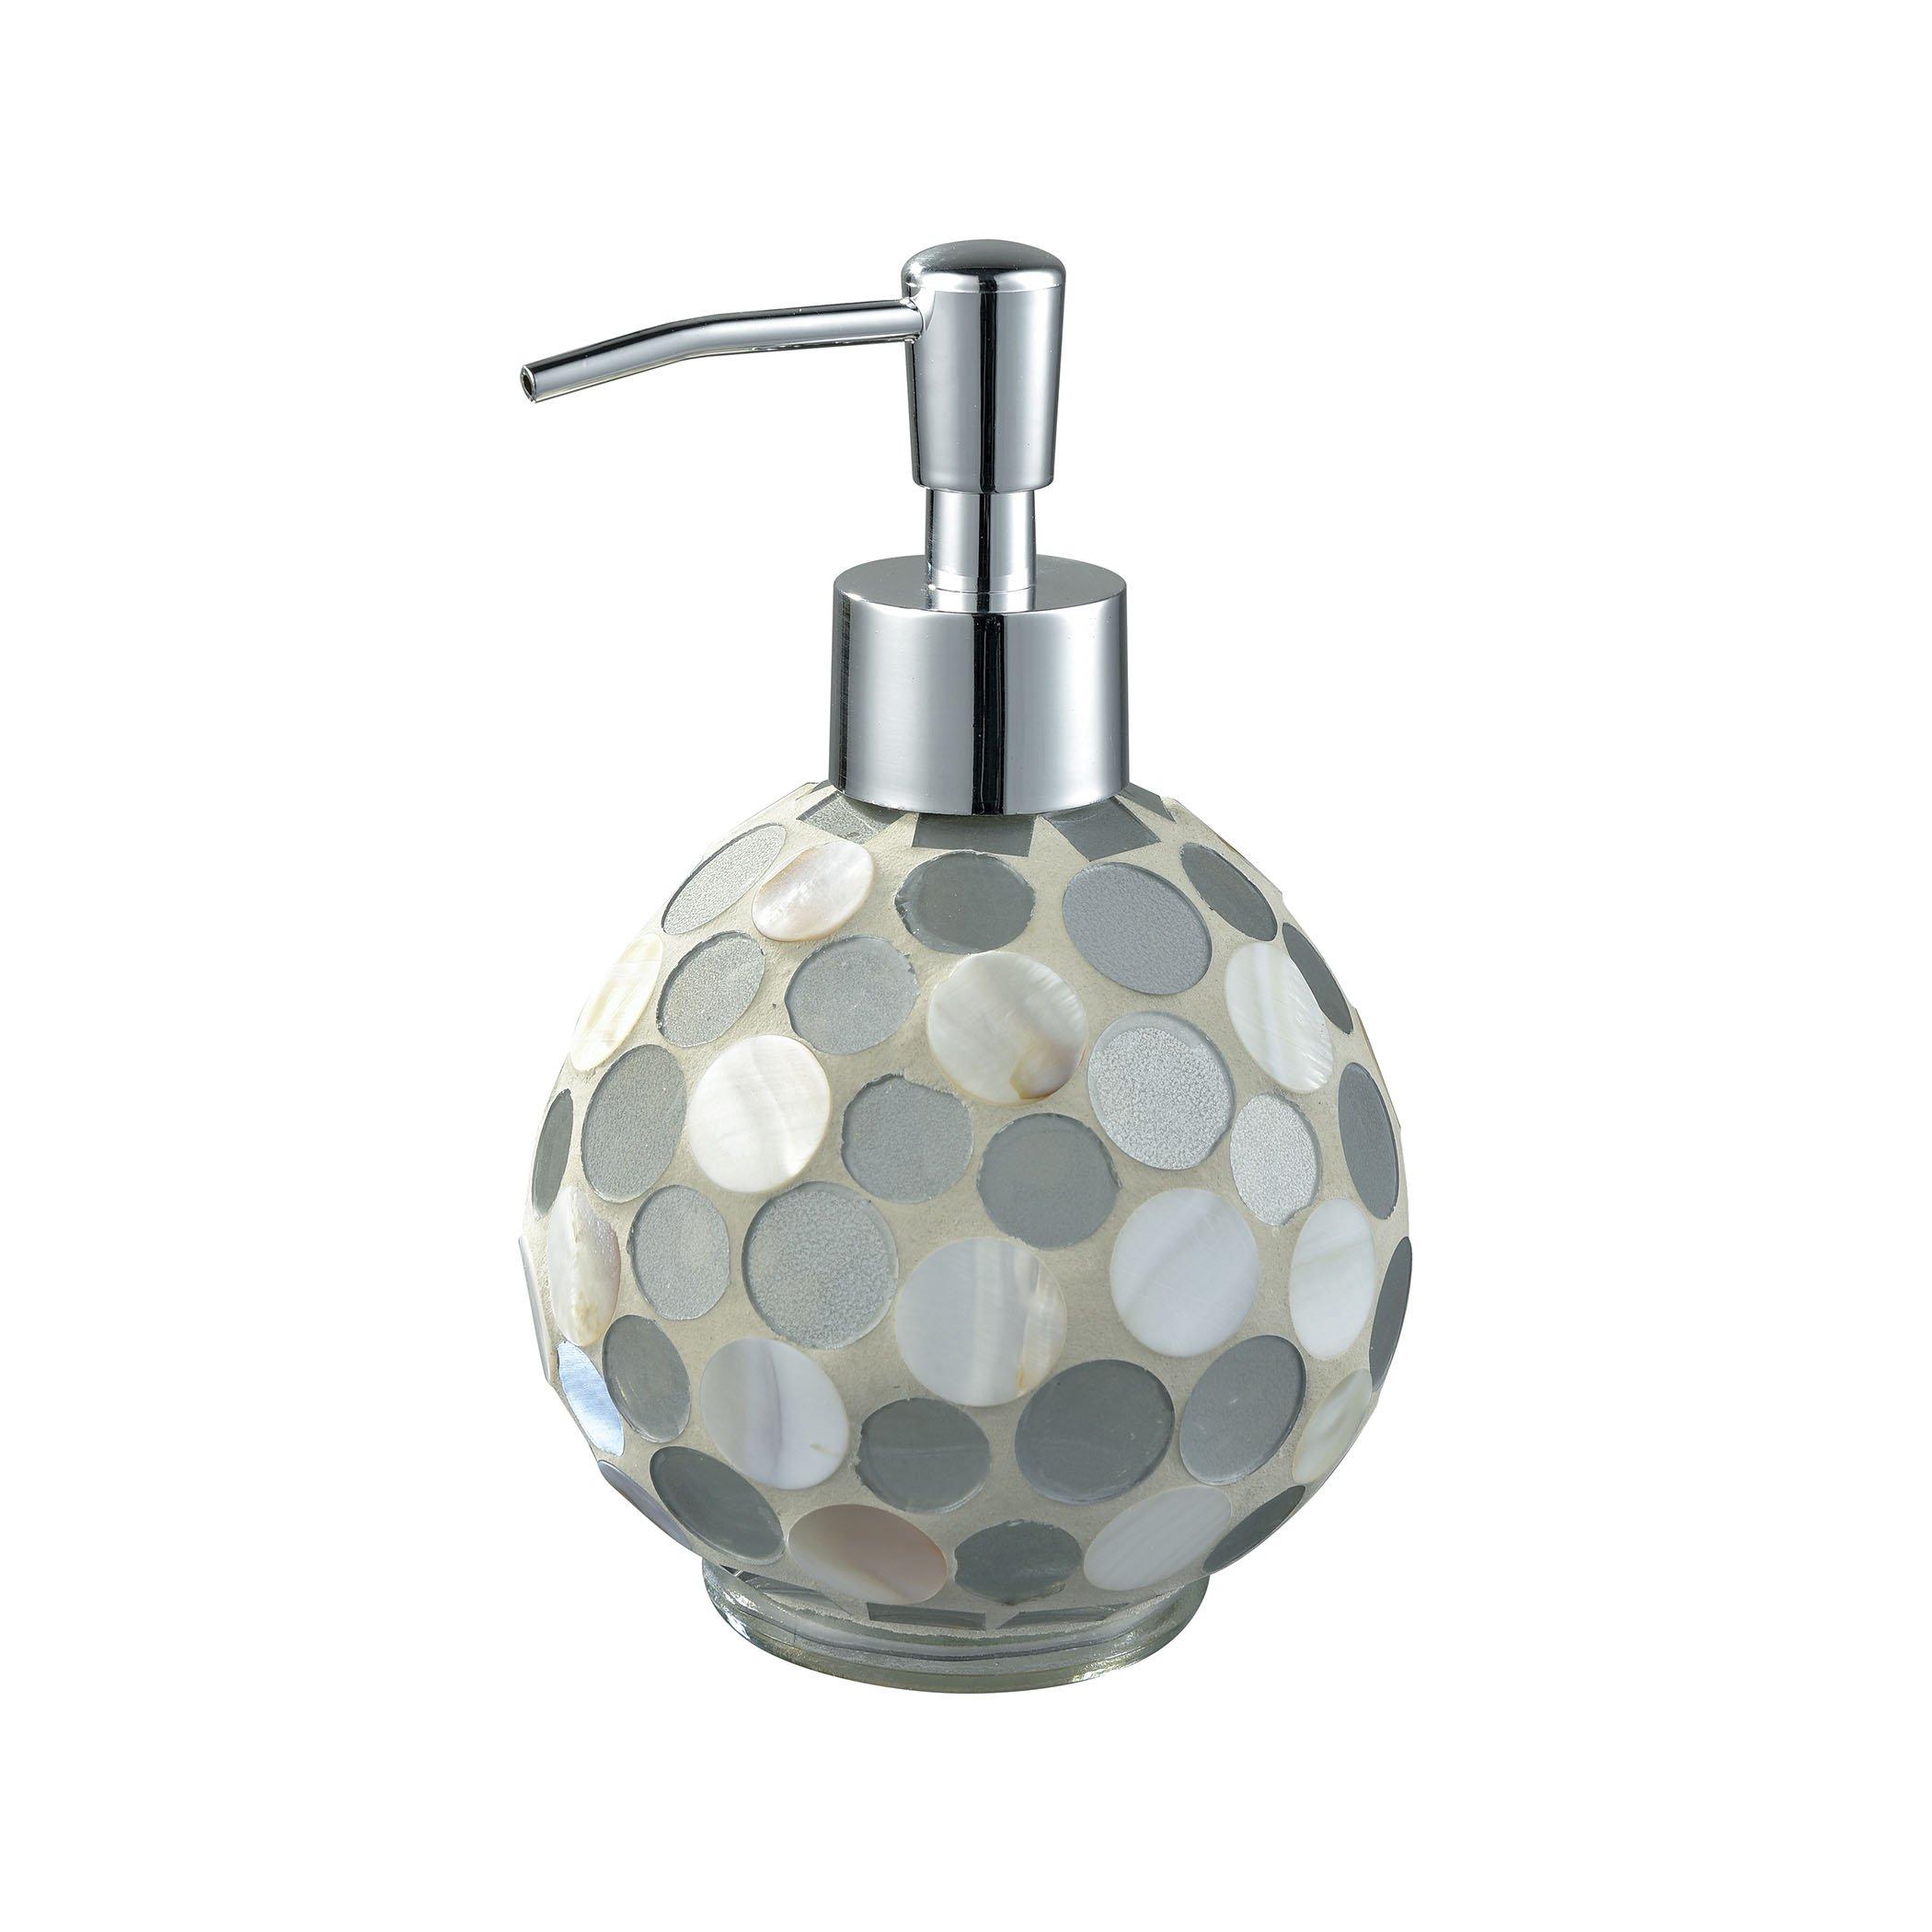 Pomeroy 556265 Mako Lotion Dispenser - FW, Brown